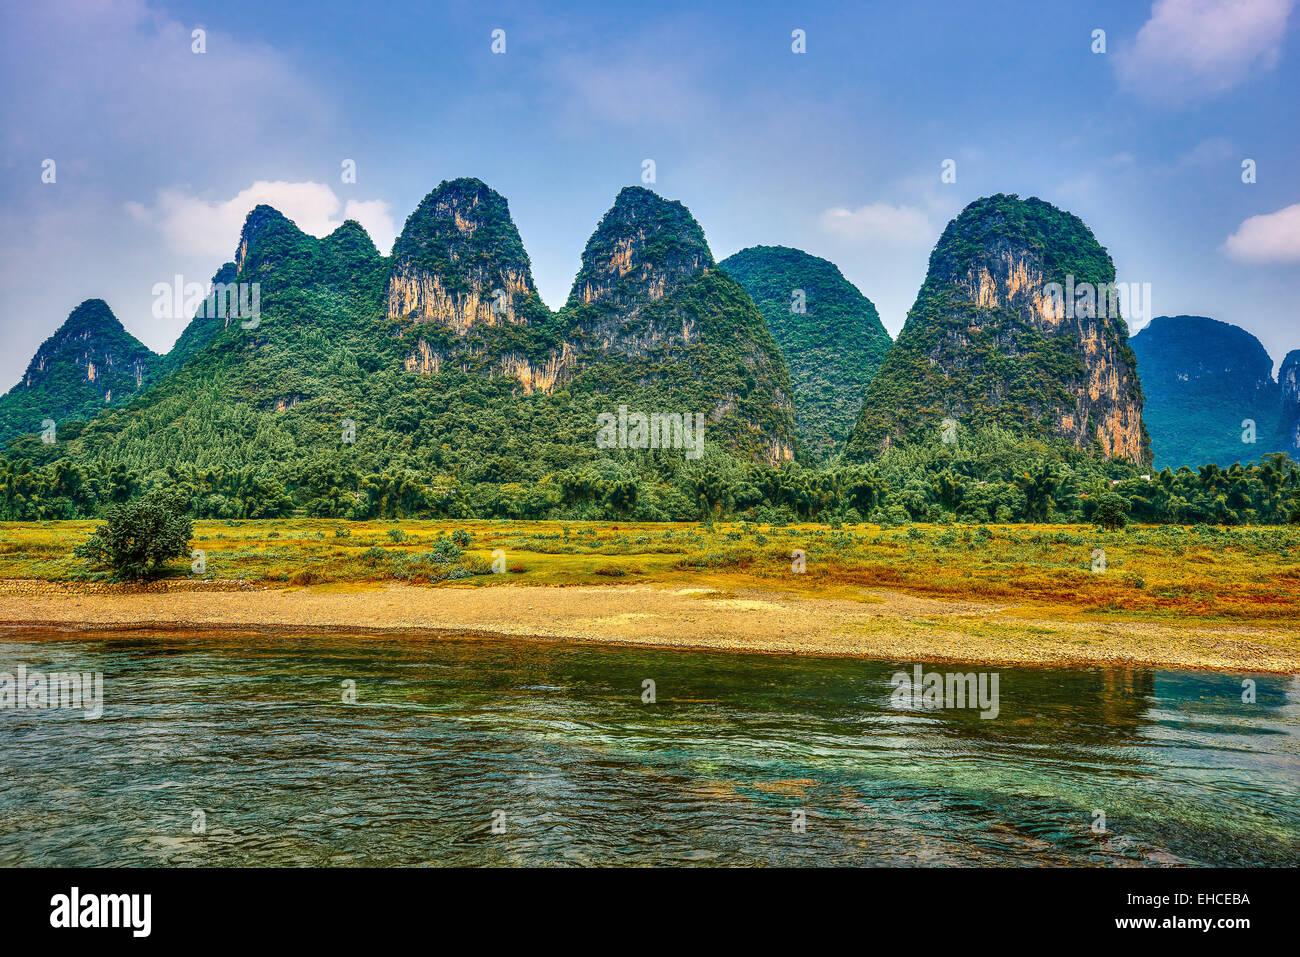 Li-Fluss zwischen Guilin und Yangshuo in Guangxi Provinz China Stockbild